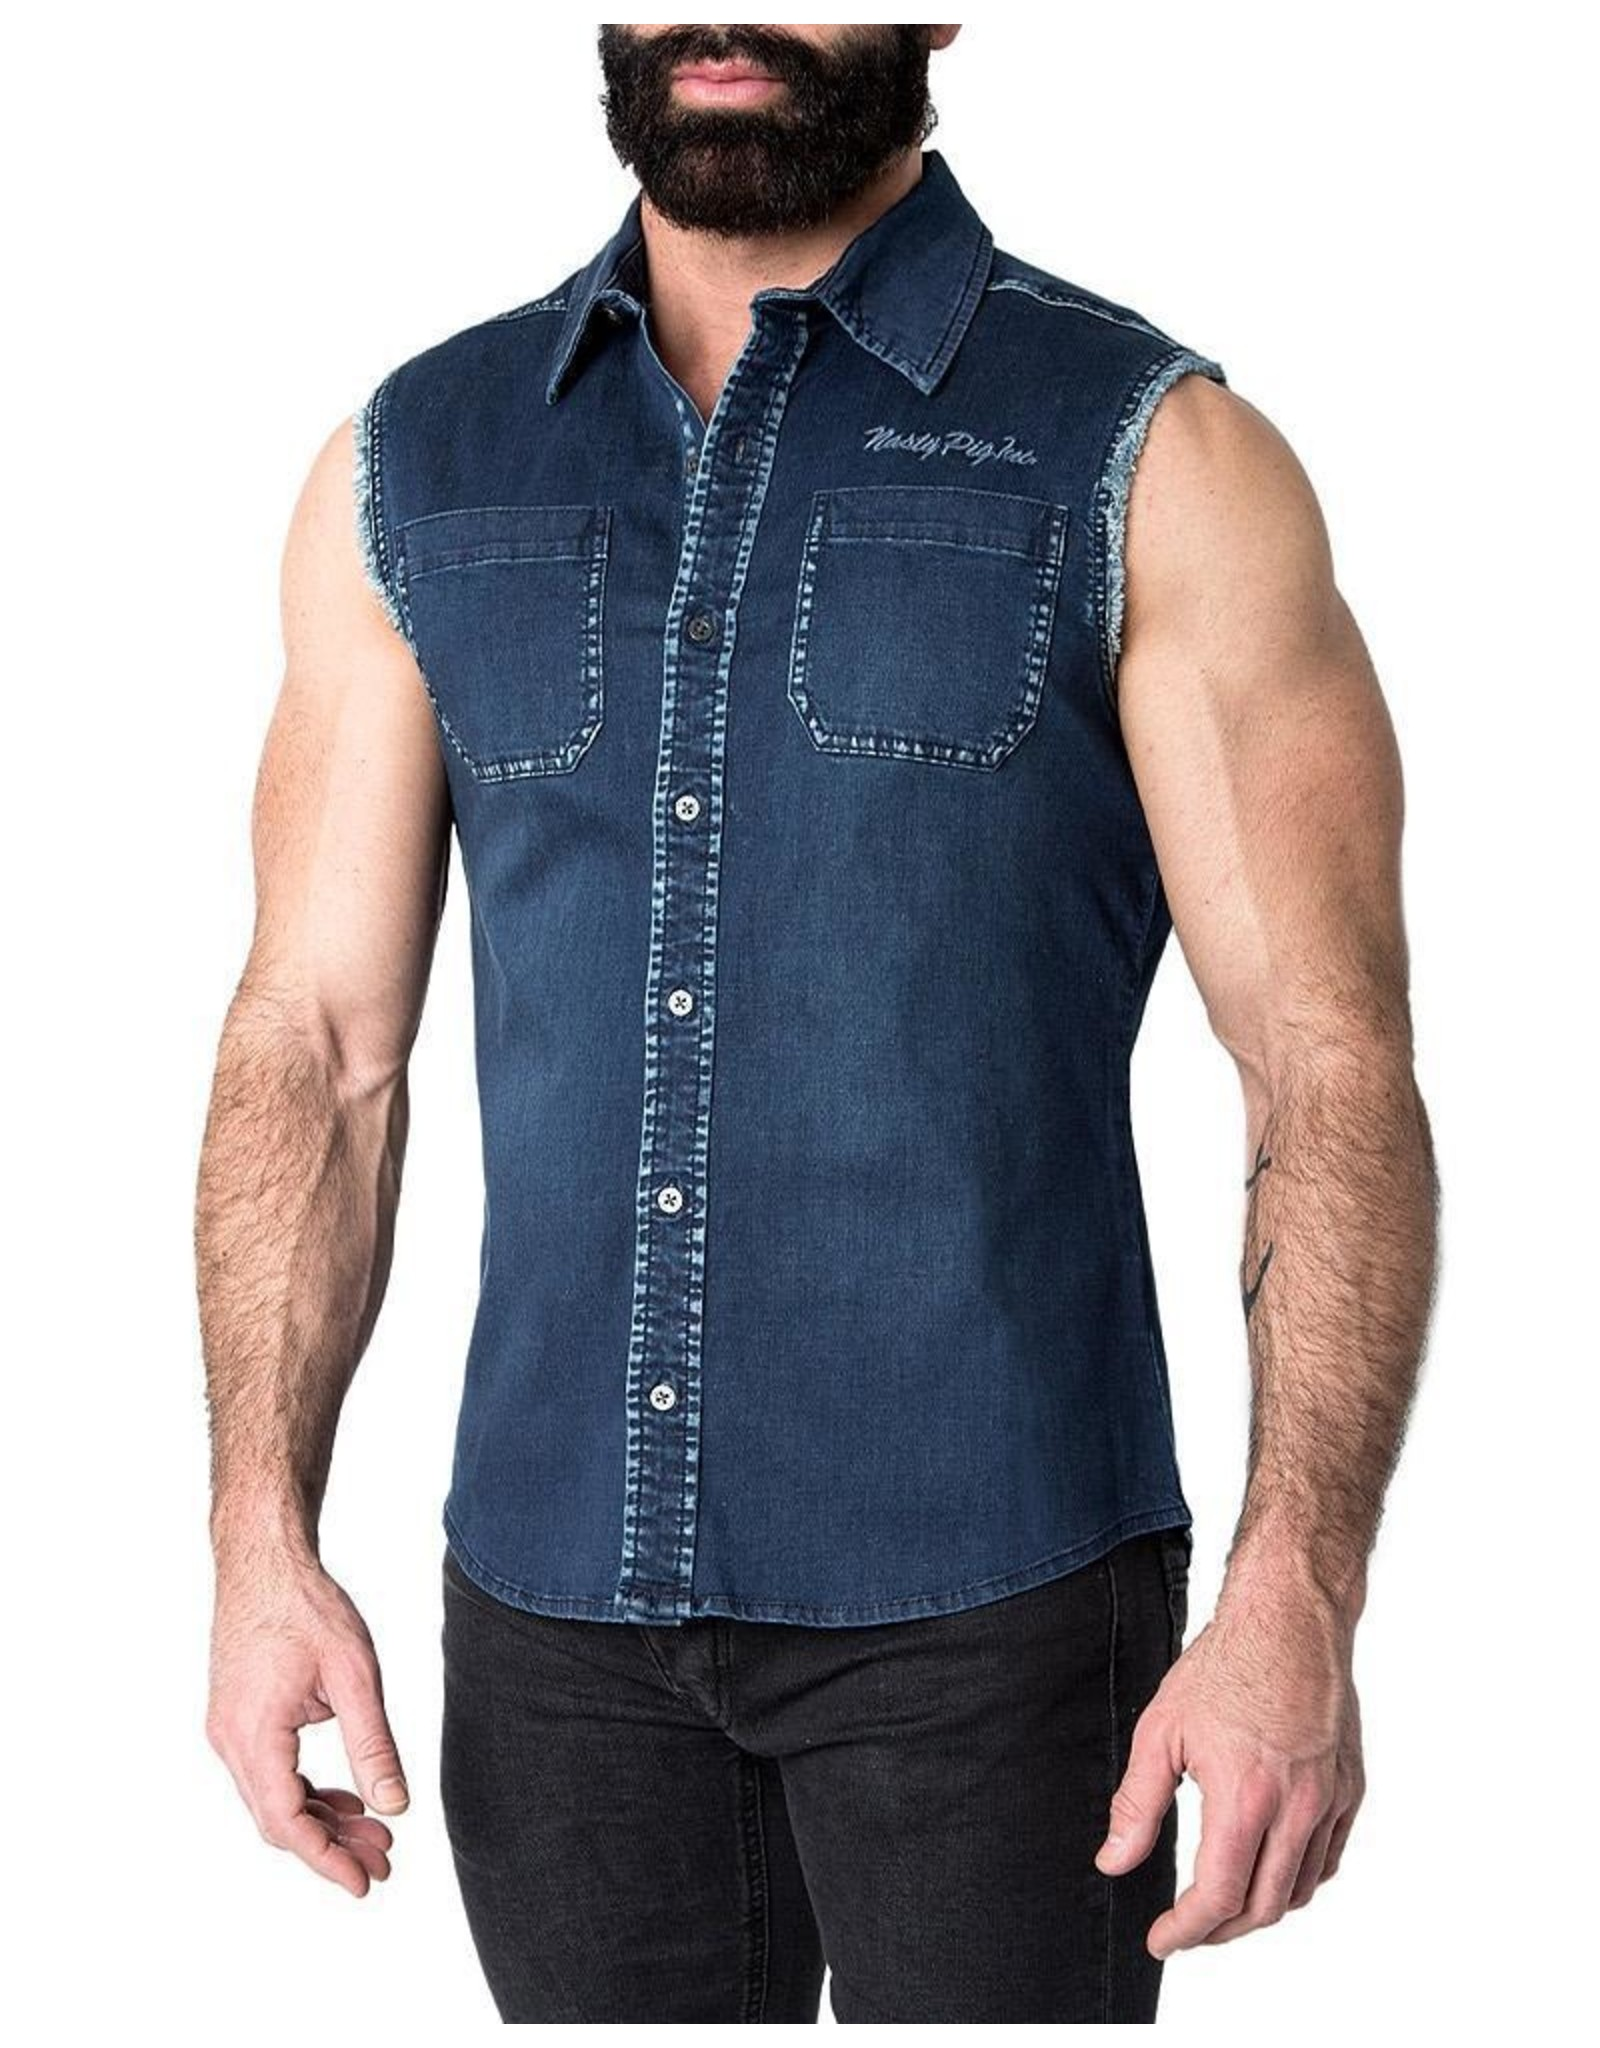 Nasty Pig Nasty Pig Overhaul Sleeveless Shirt